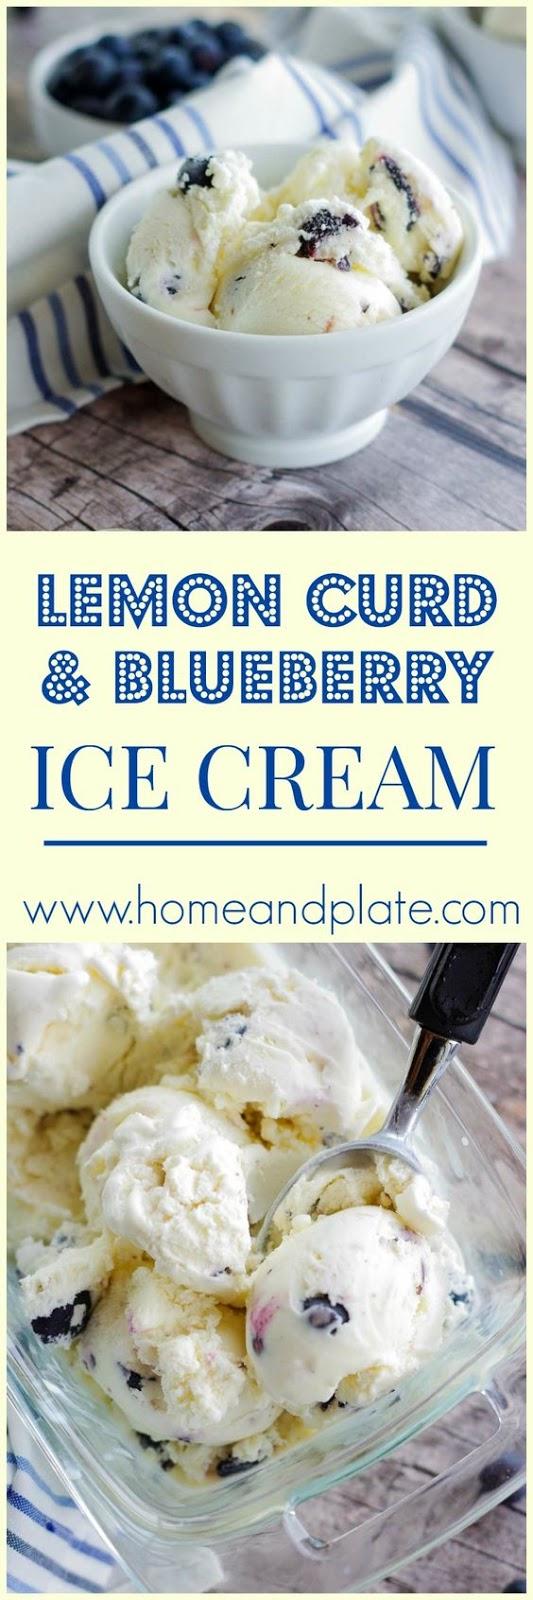 Lemon Curd  Blueberry Ice Cream